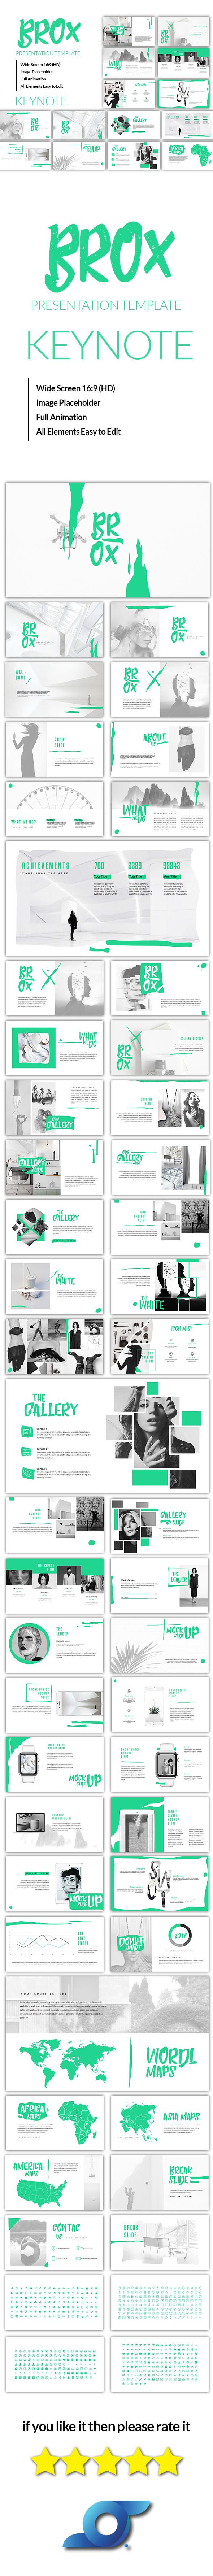 Brox - Creative Keynote Template - Creative Keynote Templates